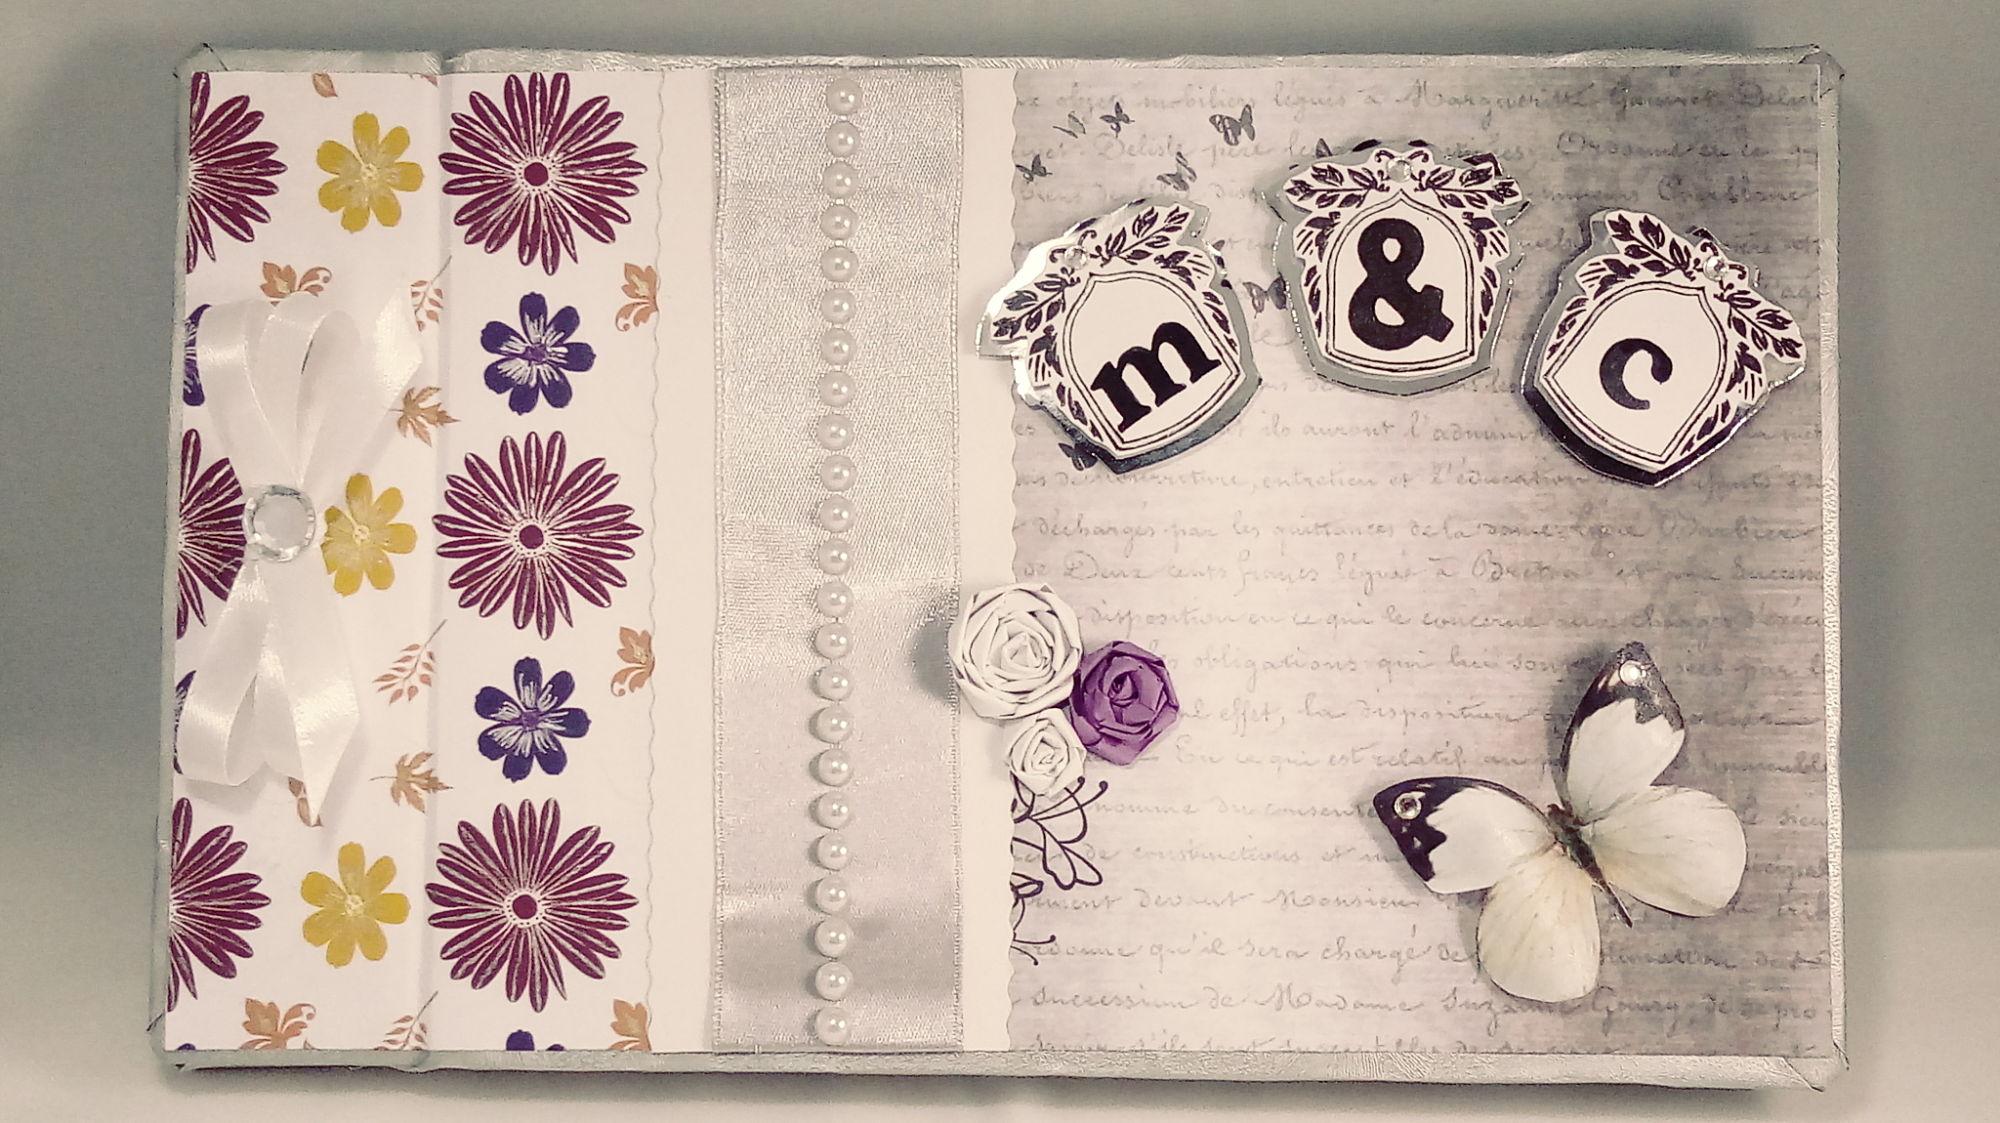 Libro de firmas para boda personalizado – Libro de firmas estilo fashion